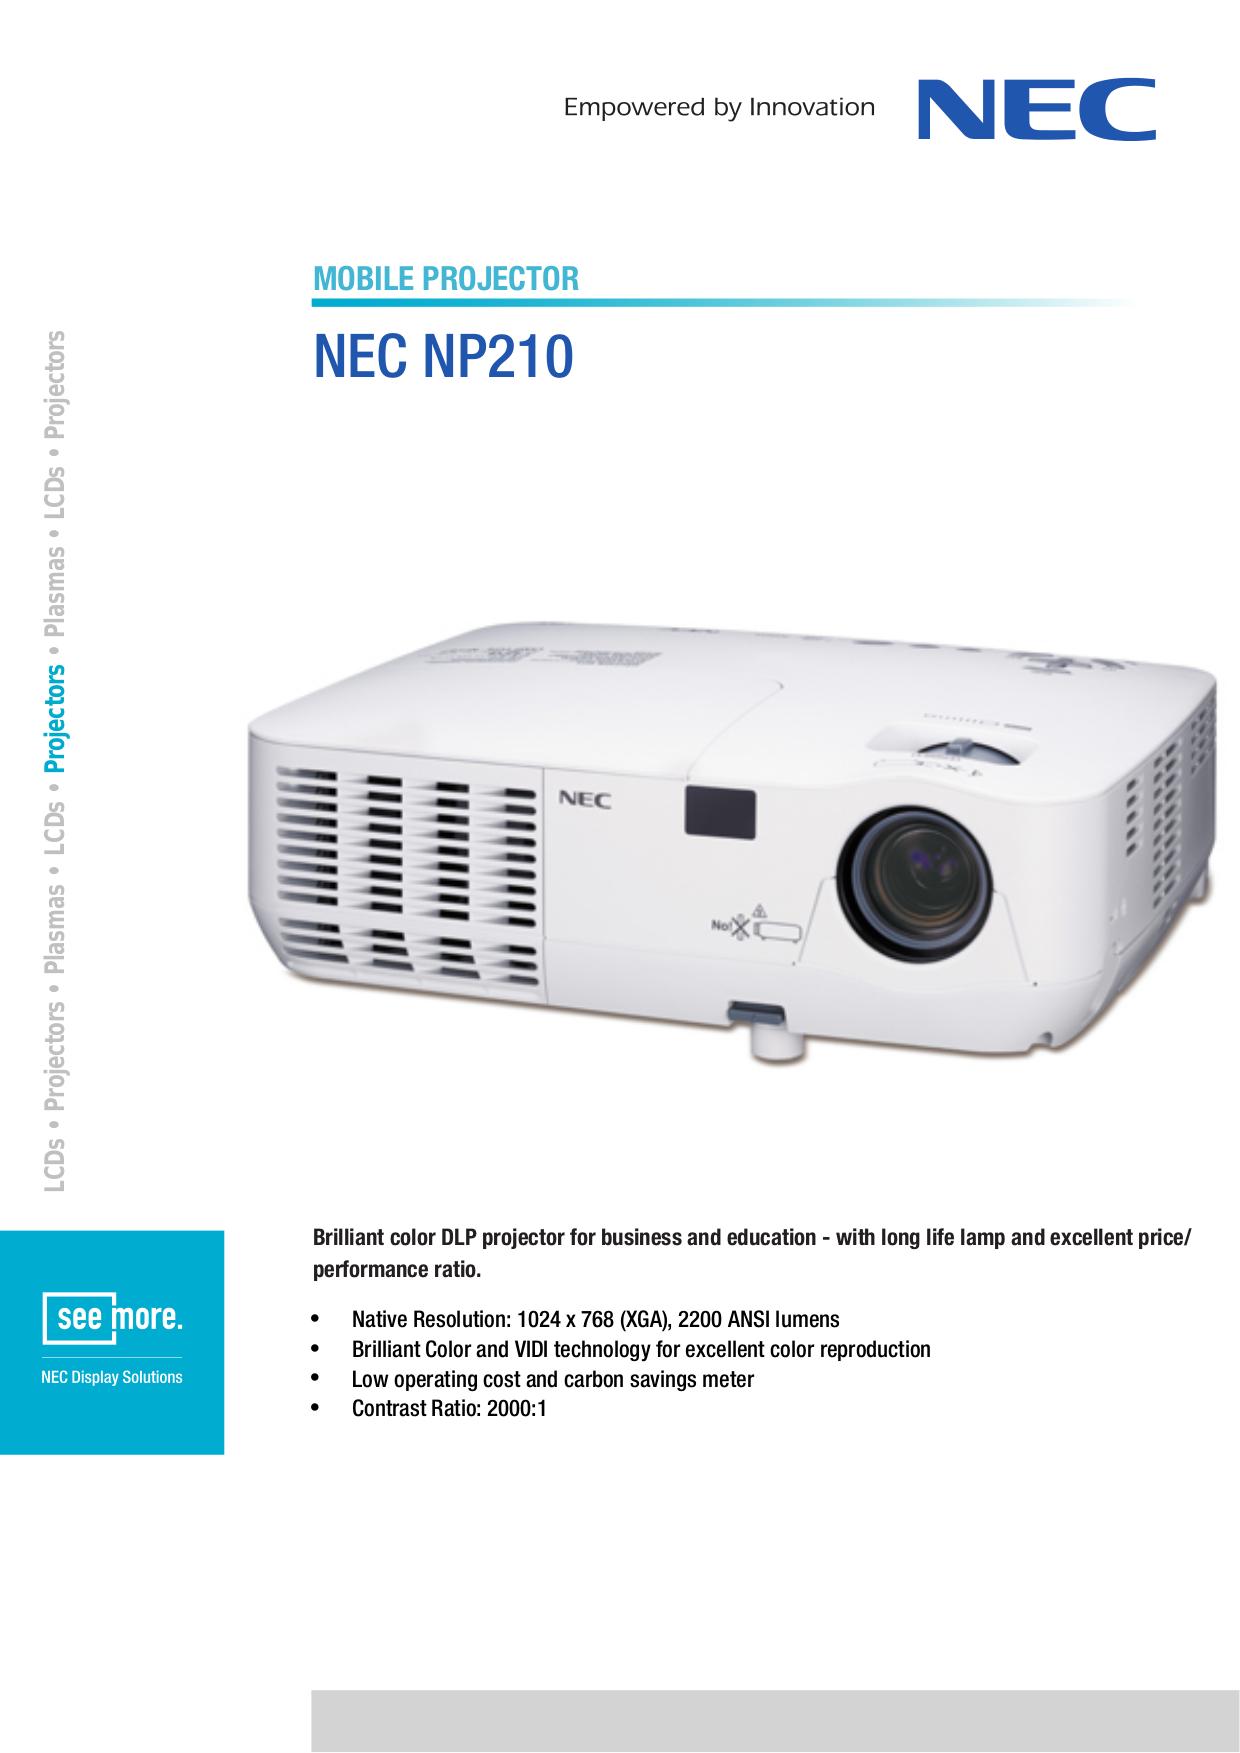 nec np215 manual daily instruction manual guides u2022 rh testingwordpress co NEC Projector Ports NEC Projector Ports